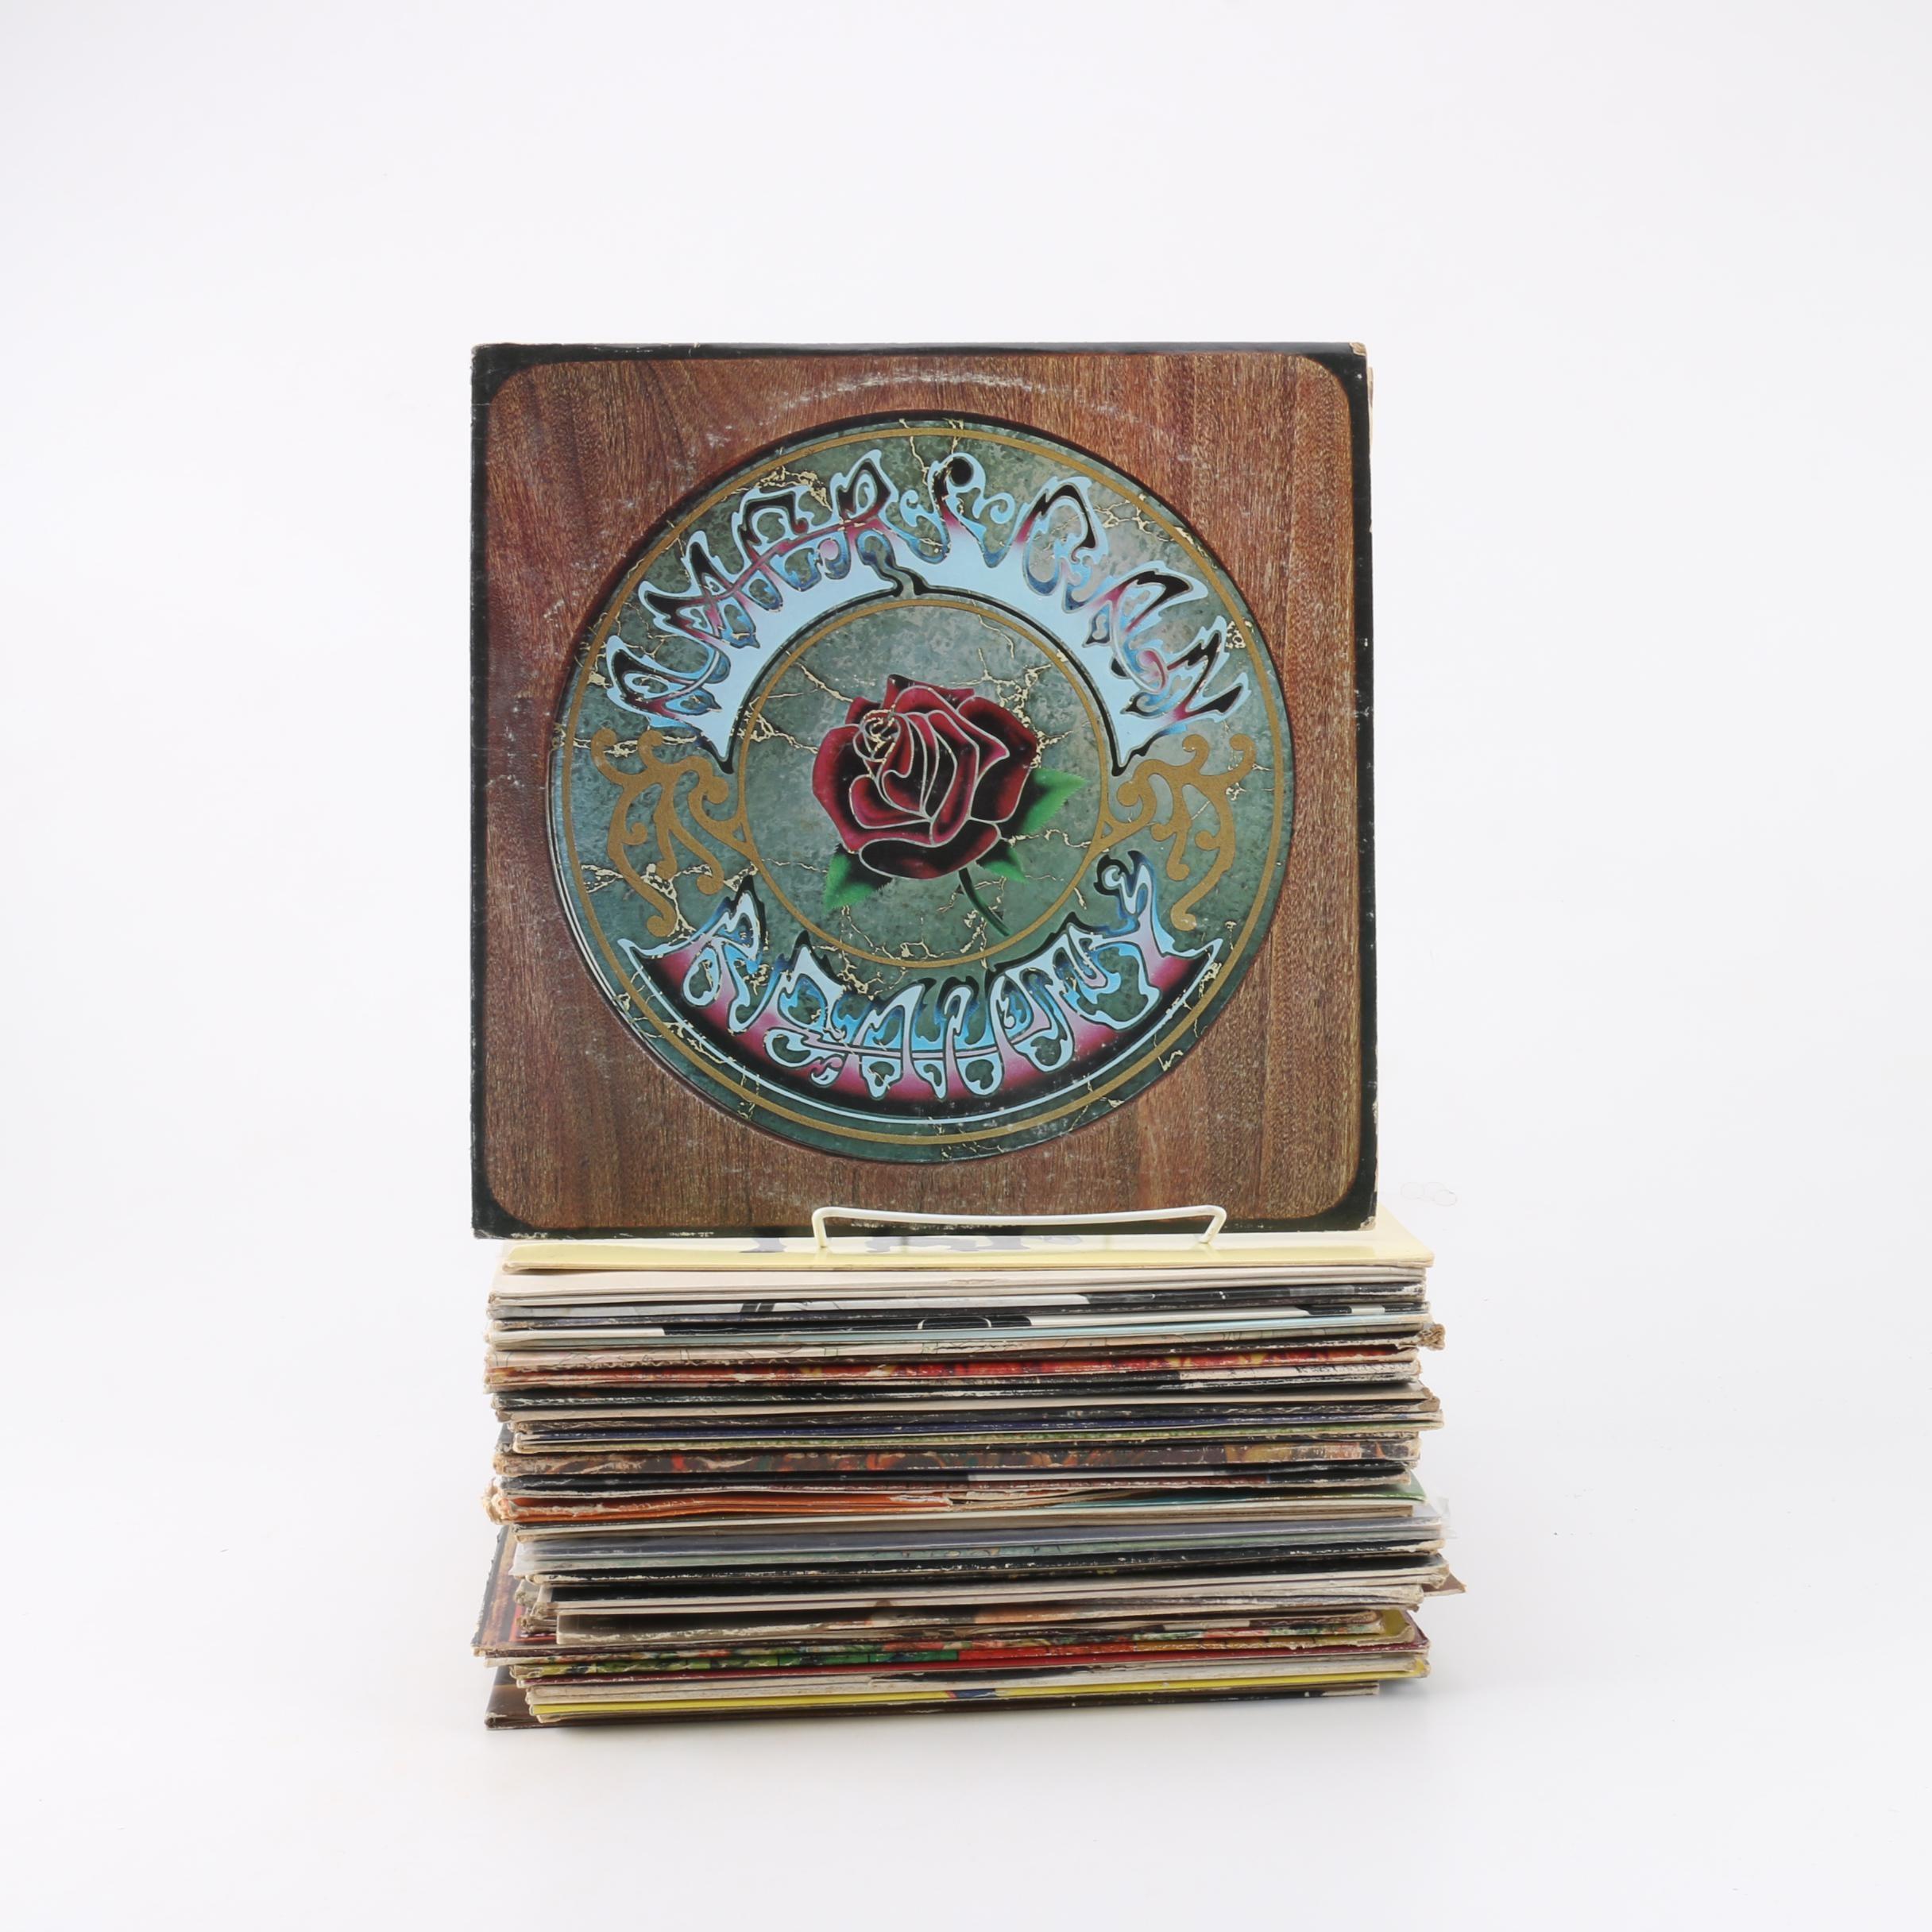 Vintage Classic Rock Records Including Grateful Dead, Fleetwood Mac, The Beatles